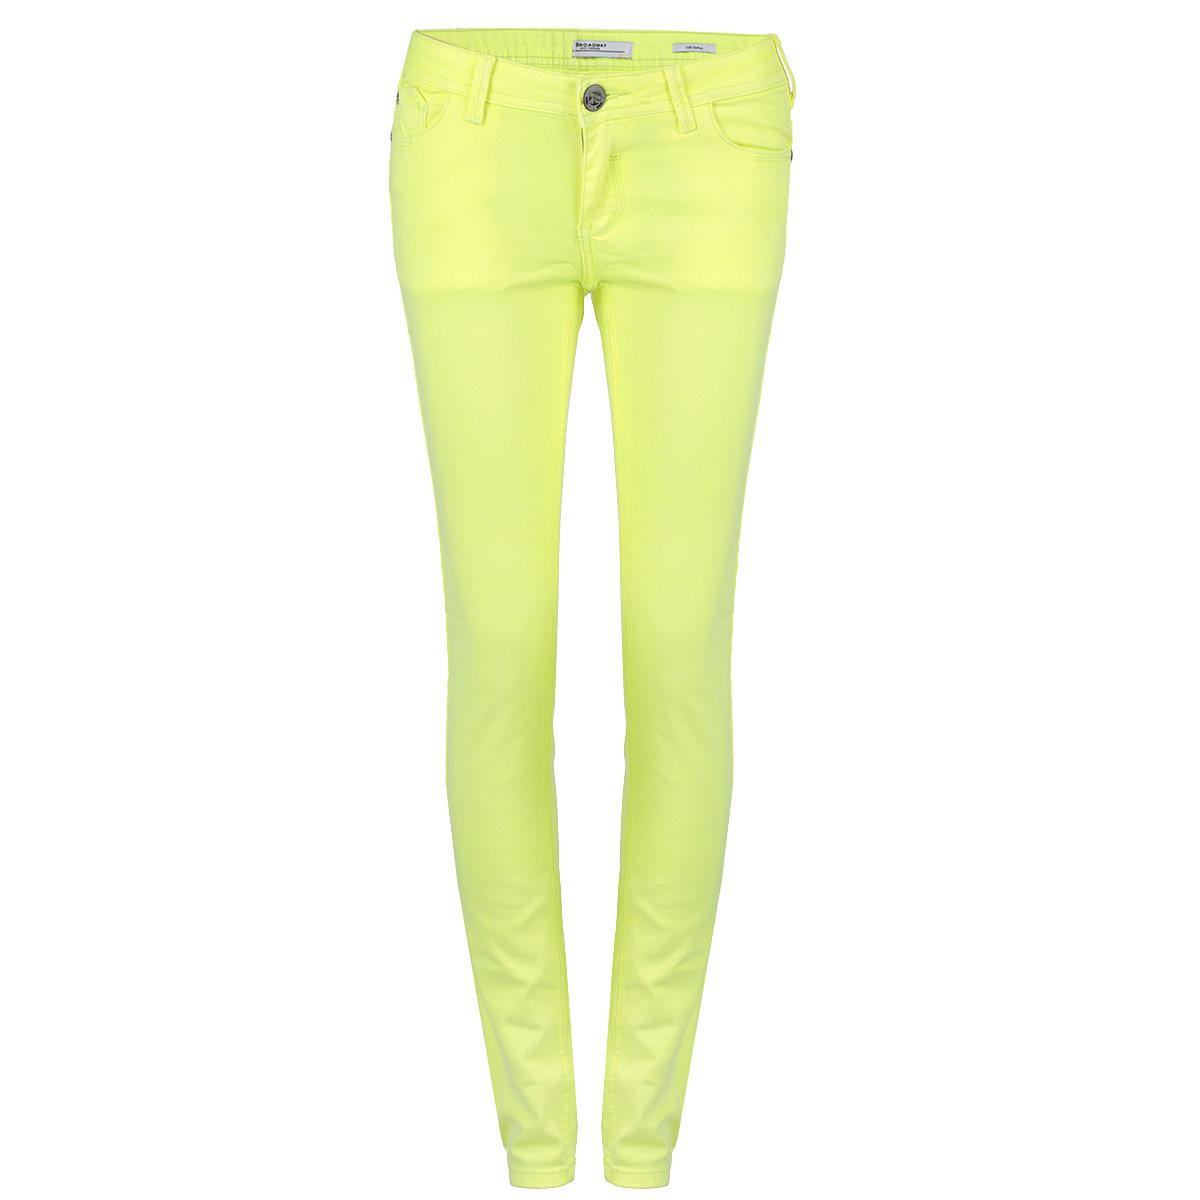 ������ �������. 60100719 - Broadway60100719 153-neon yellow�������� ������� ������ Broadway ������� ���������� ��� ����, ����� ������������ ����������� ����� ������. ������ ���������� ���� � ���������� ������� ������ �������� ����������� � ������ ������������ ������. ������������� ������ �� �������� � ����� � ������� �� ��������-������, ������� ������ ��� �����. ������� ������ ��������� ����� �������� ��������� � ����� ��������� ��������� ���������, � ����� - ����� ���������� ���������. ��� ������ � � ���� ����� ���������� ������ �������� �������� ����������� � ������ ���������. � ��� �� ������ ������ ����������� ���� ����� � ���������.